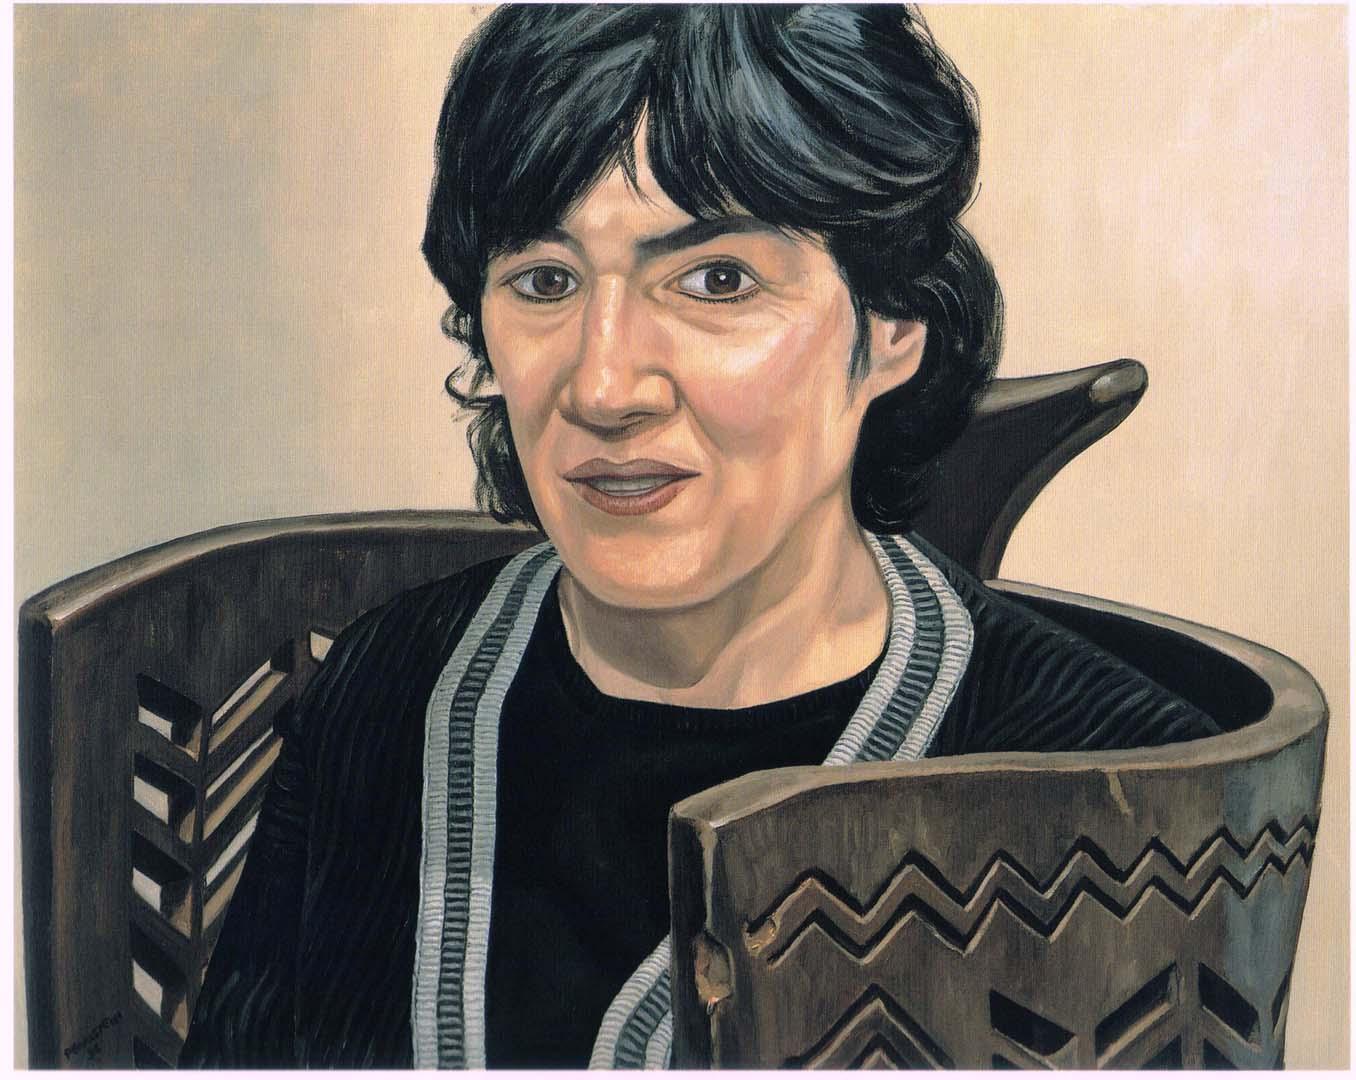 1996 Portrait of Jane Kaplowitz Oil on canvas 24 x 30